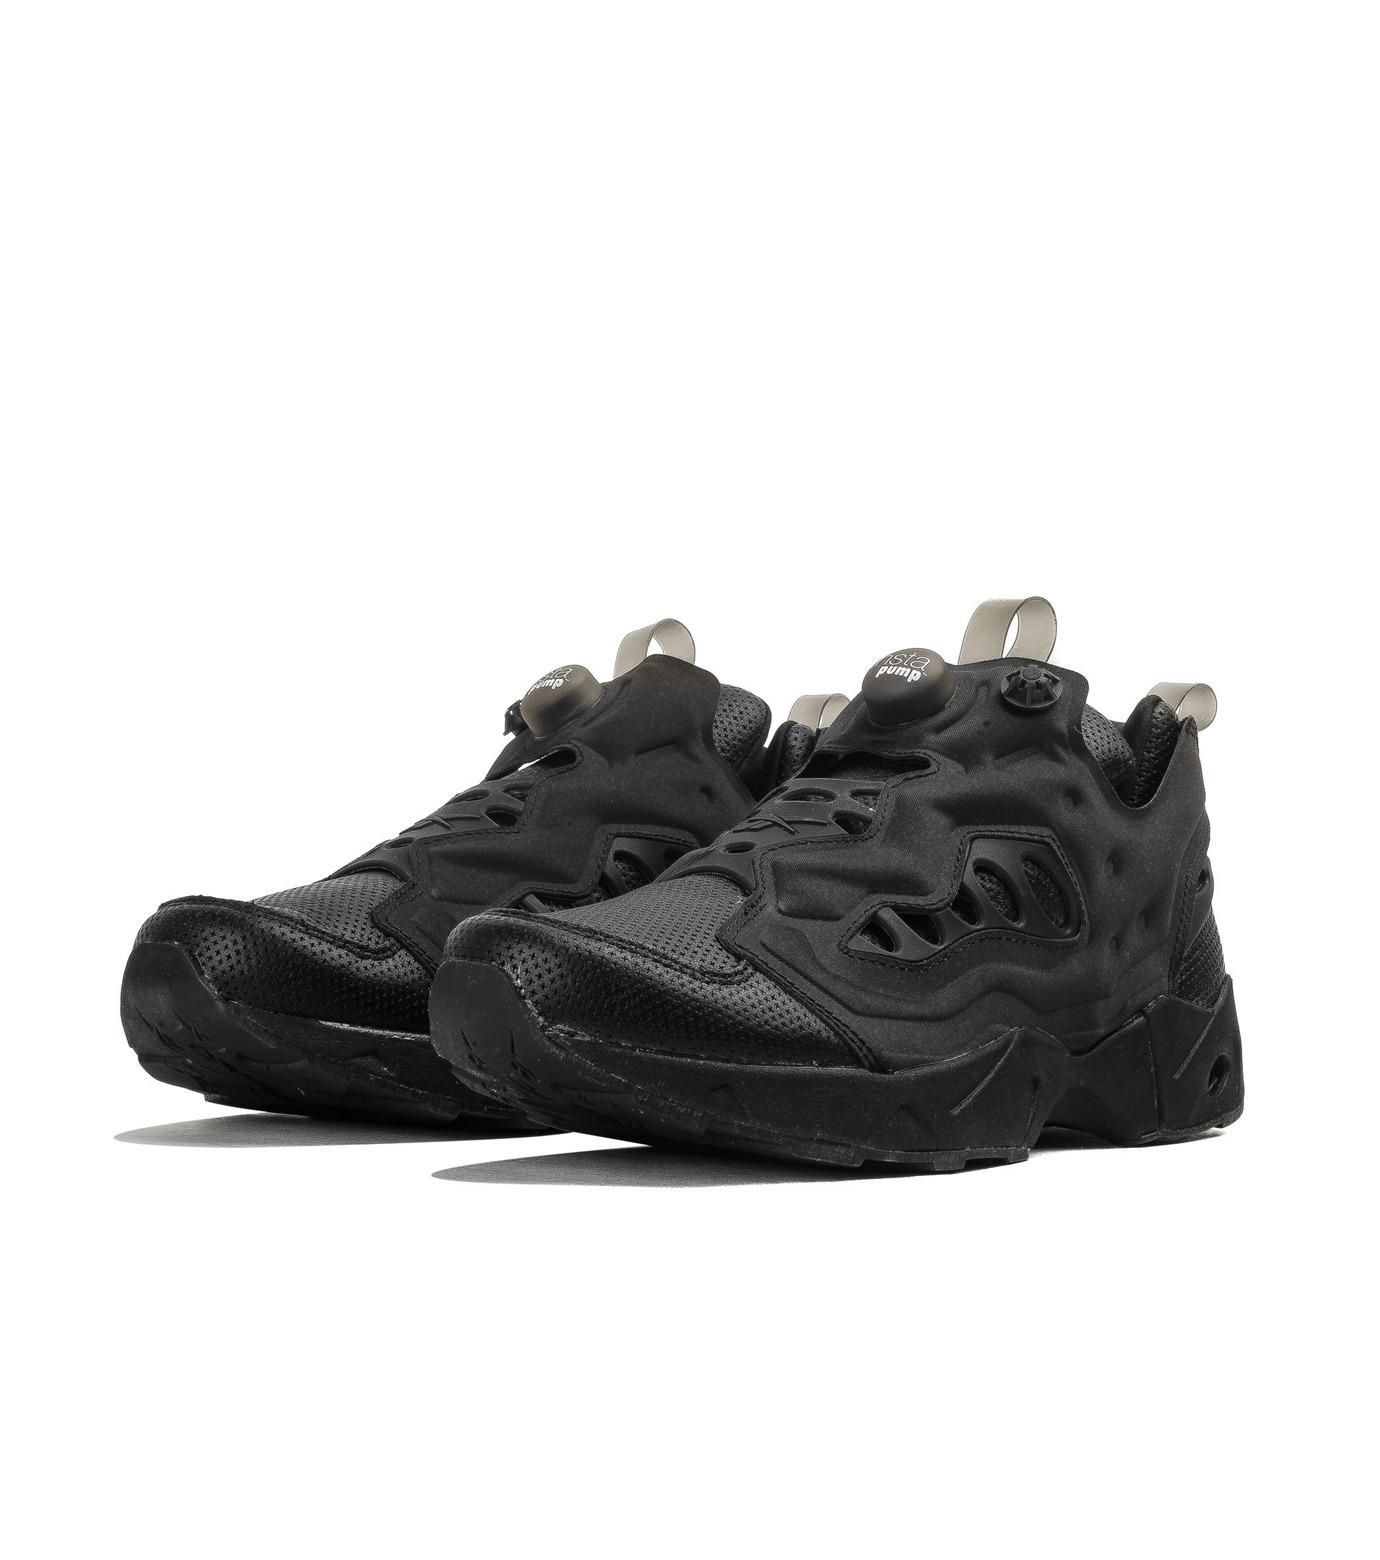 Reebok(リーボック)のINSTAPUMP FURY ROAD PL-BLACK(シューズ/shoes)-AQ9978-13 拡大詳細画像3